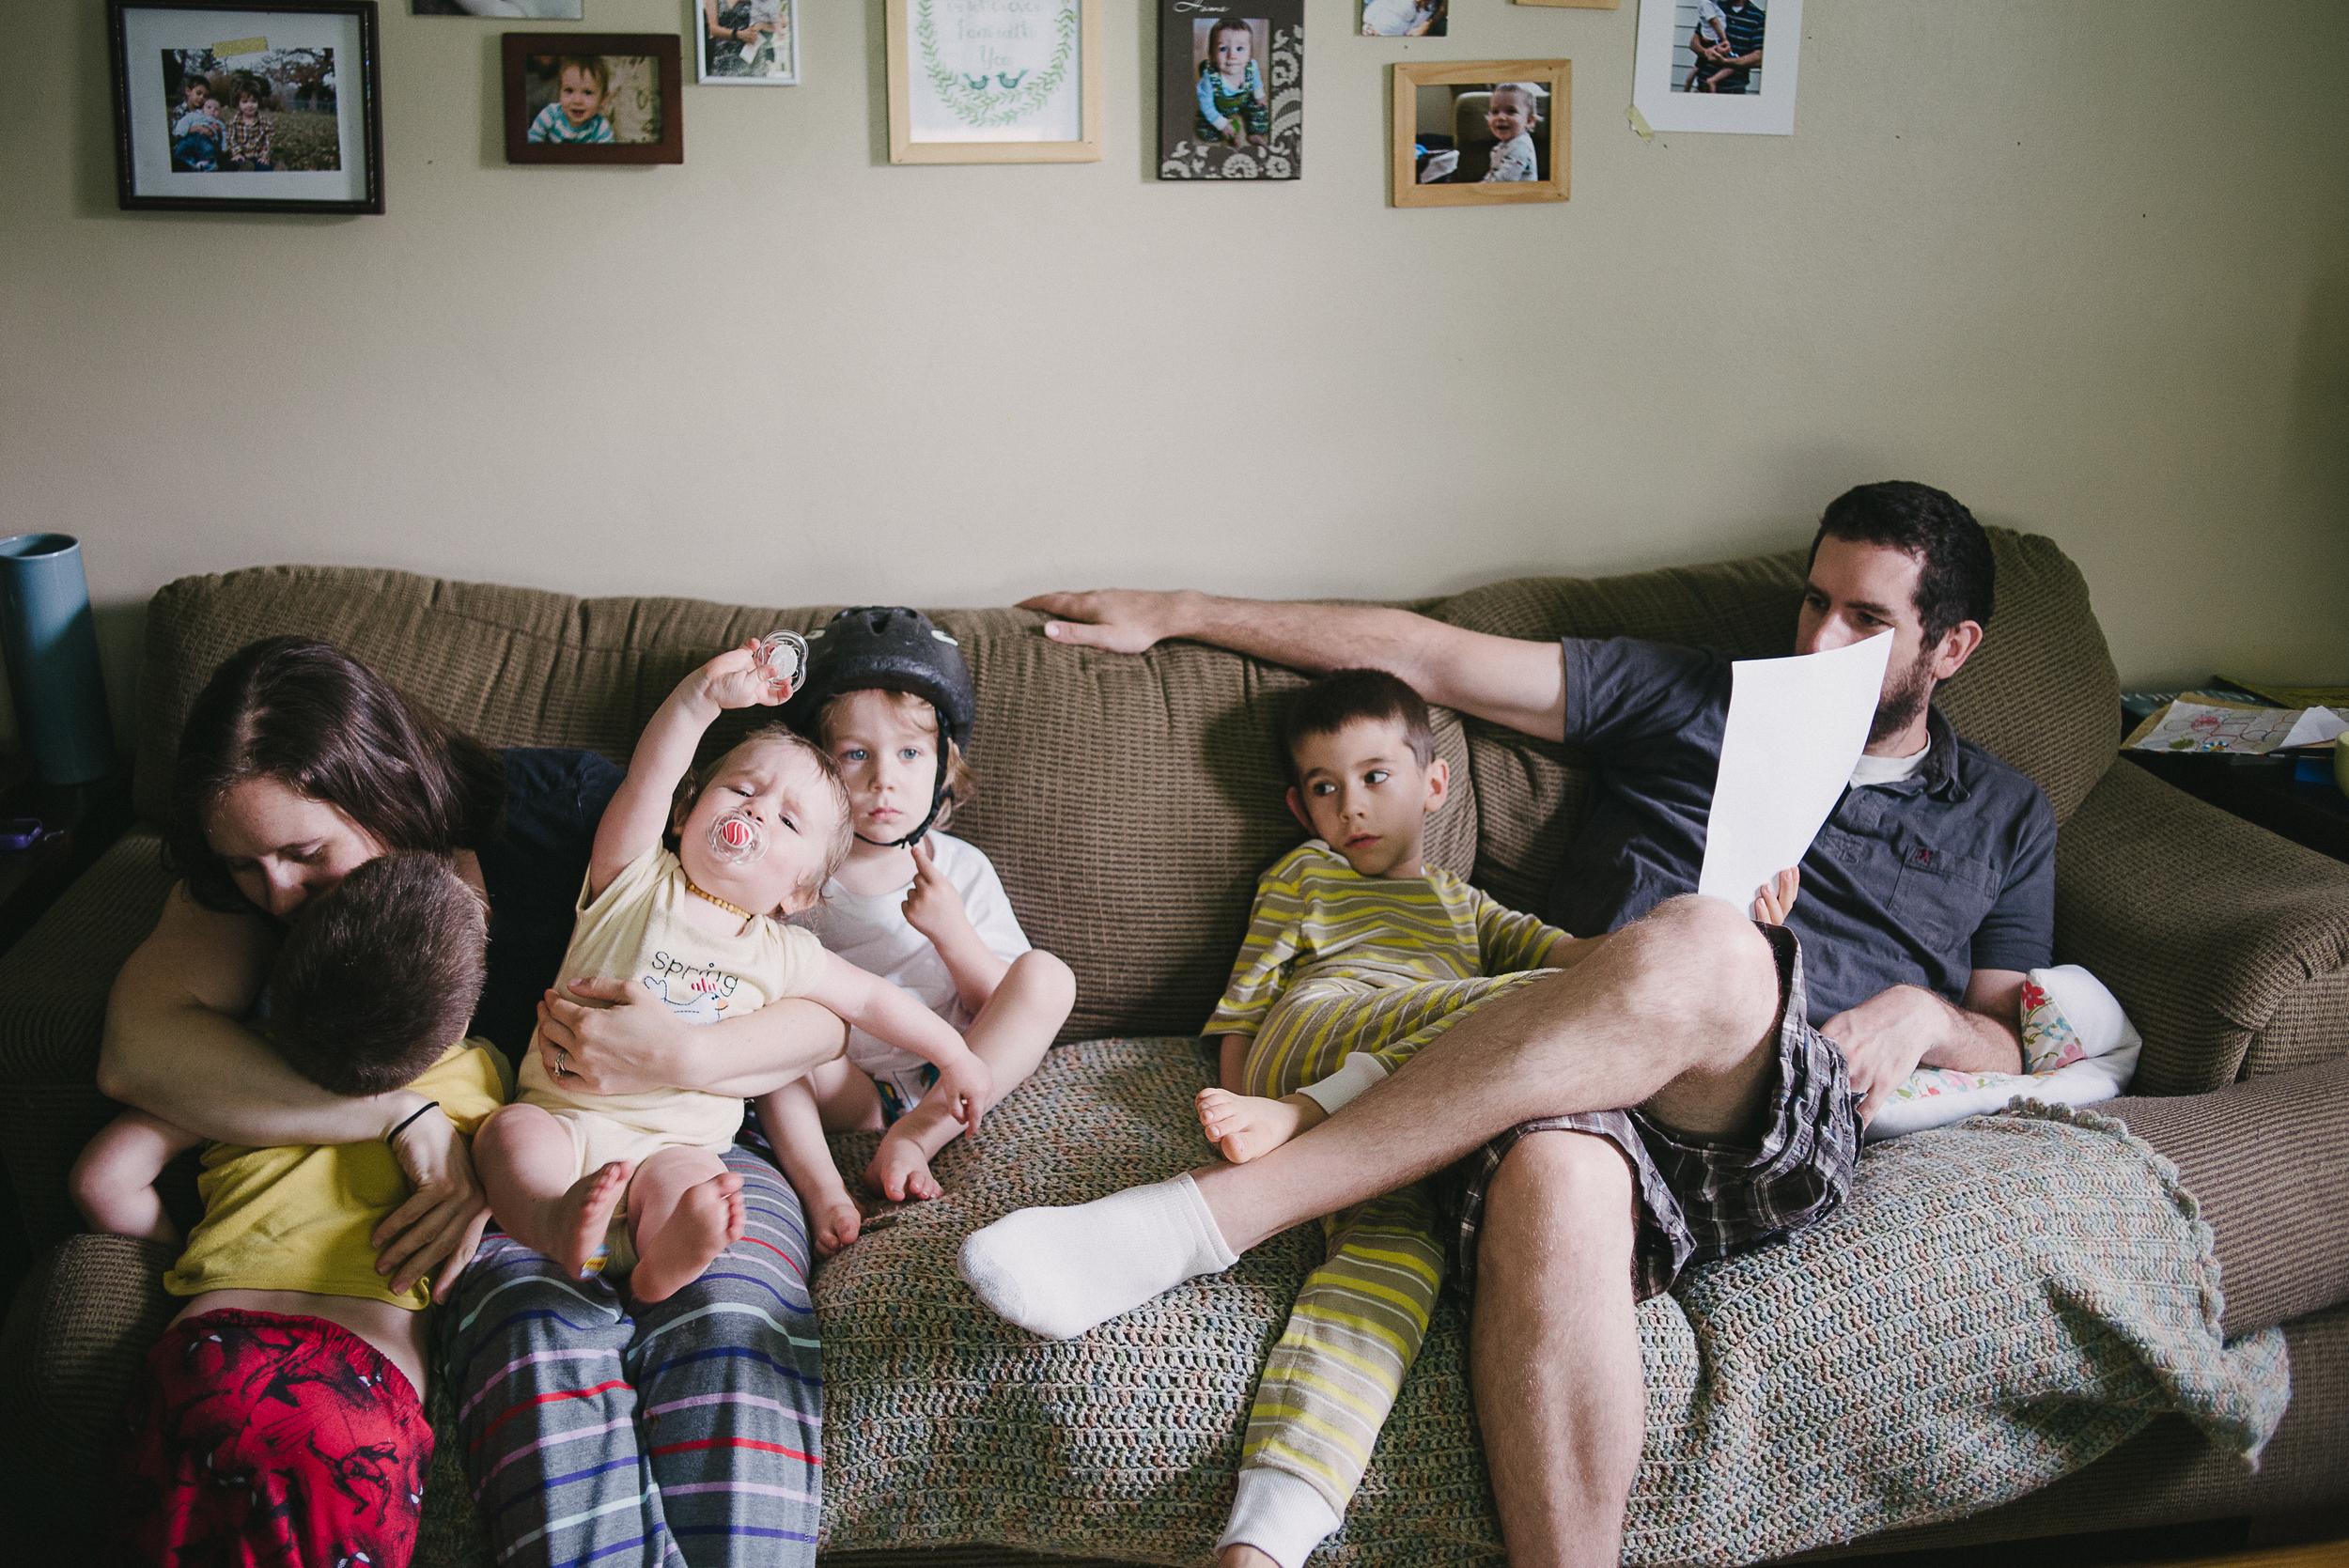 dan-jess-family-on-sofa-1.jpg